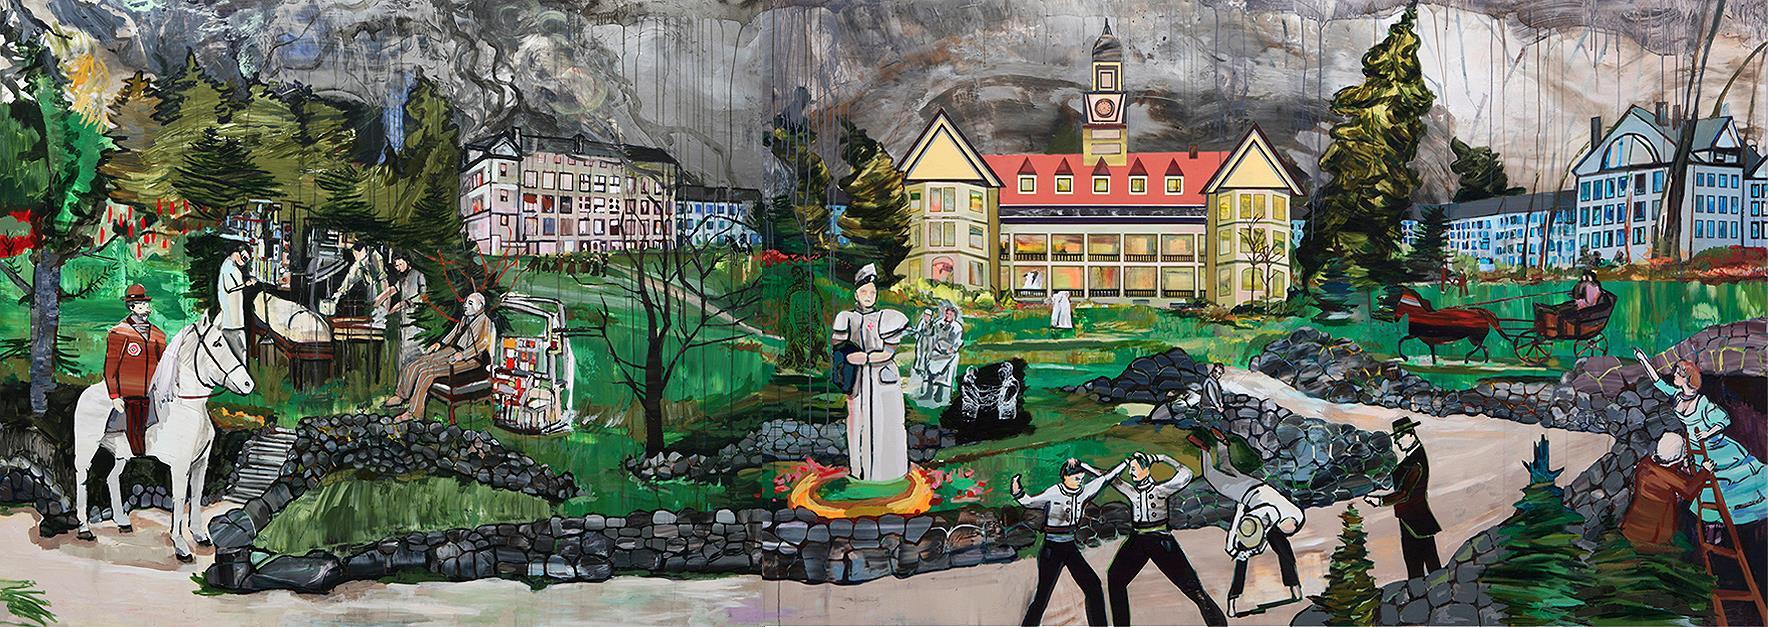 Brattleboro Retreat, 2006 - 2007